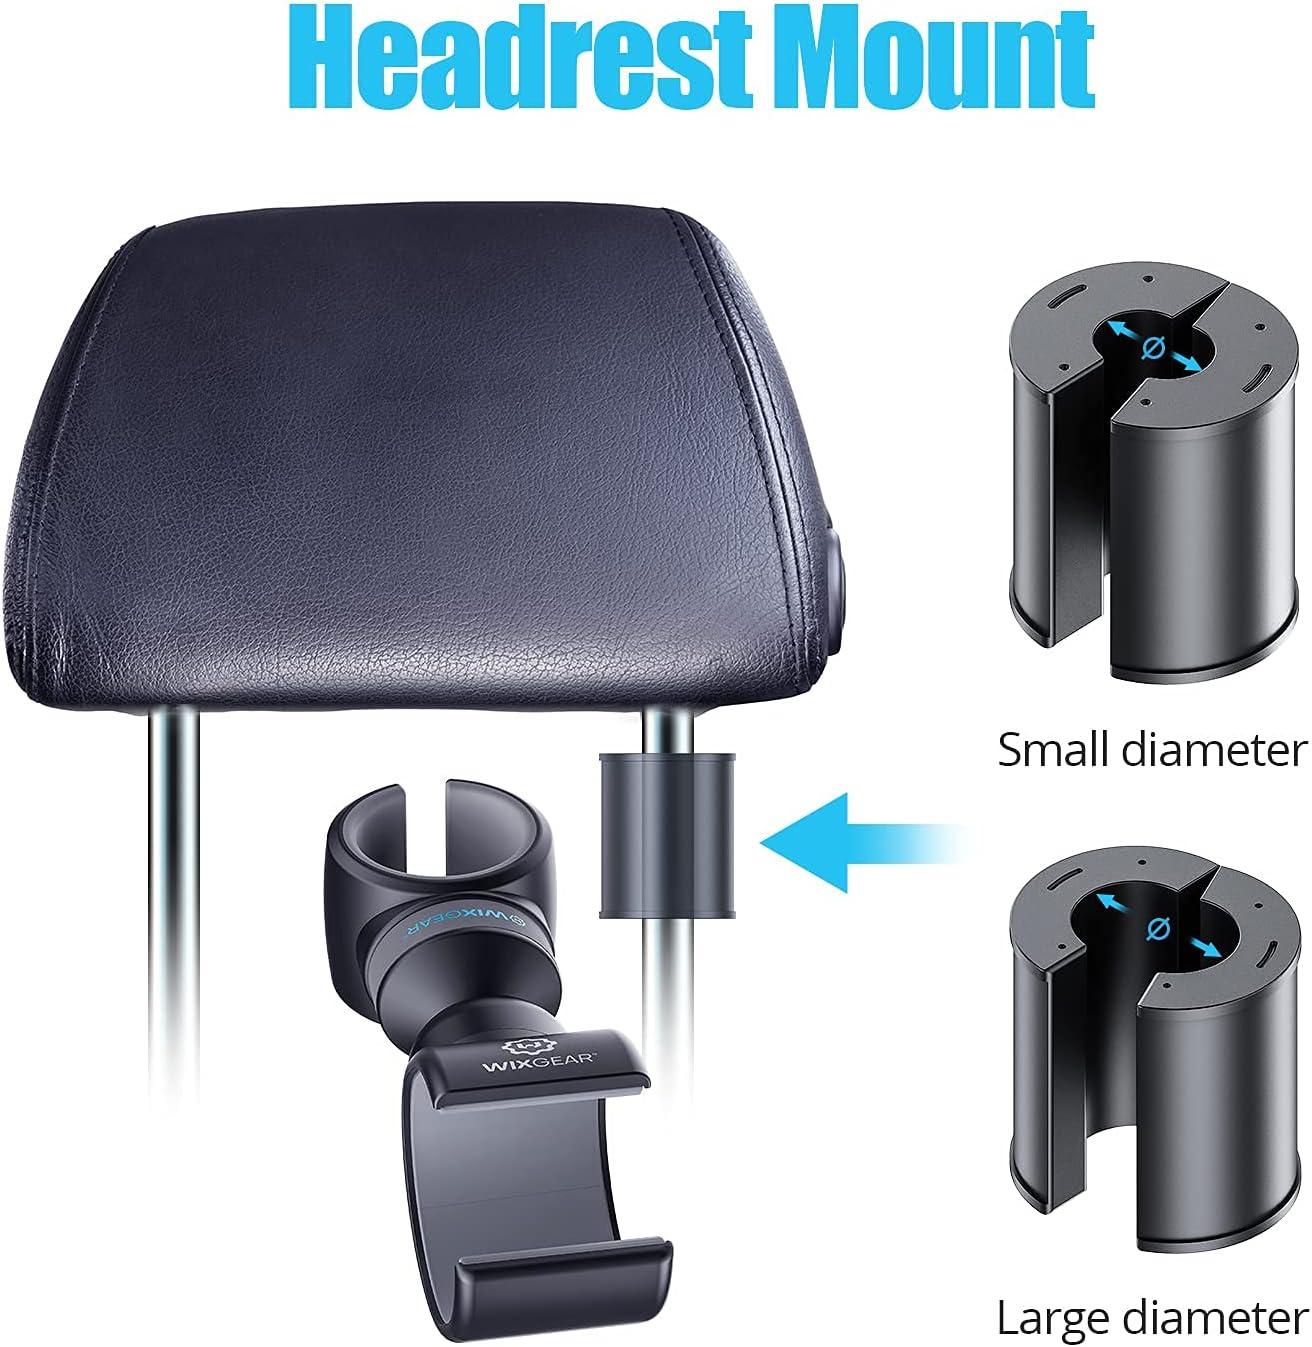 headrest mount as a steering wheel phone holder